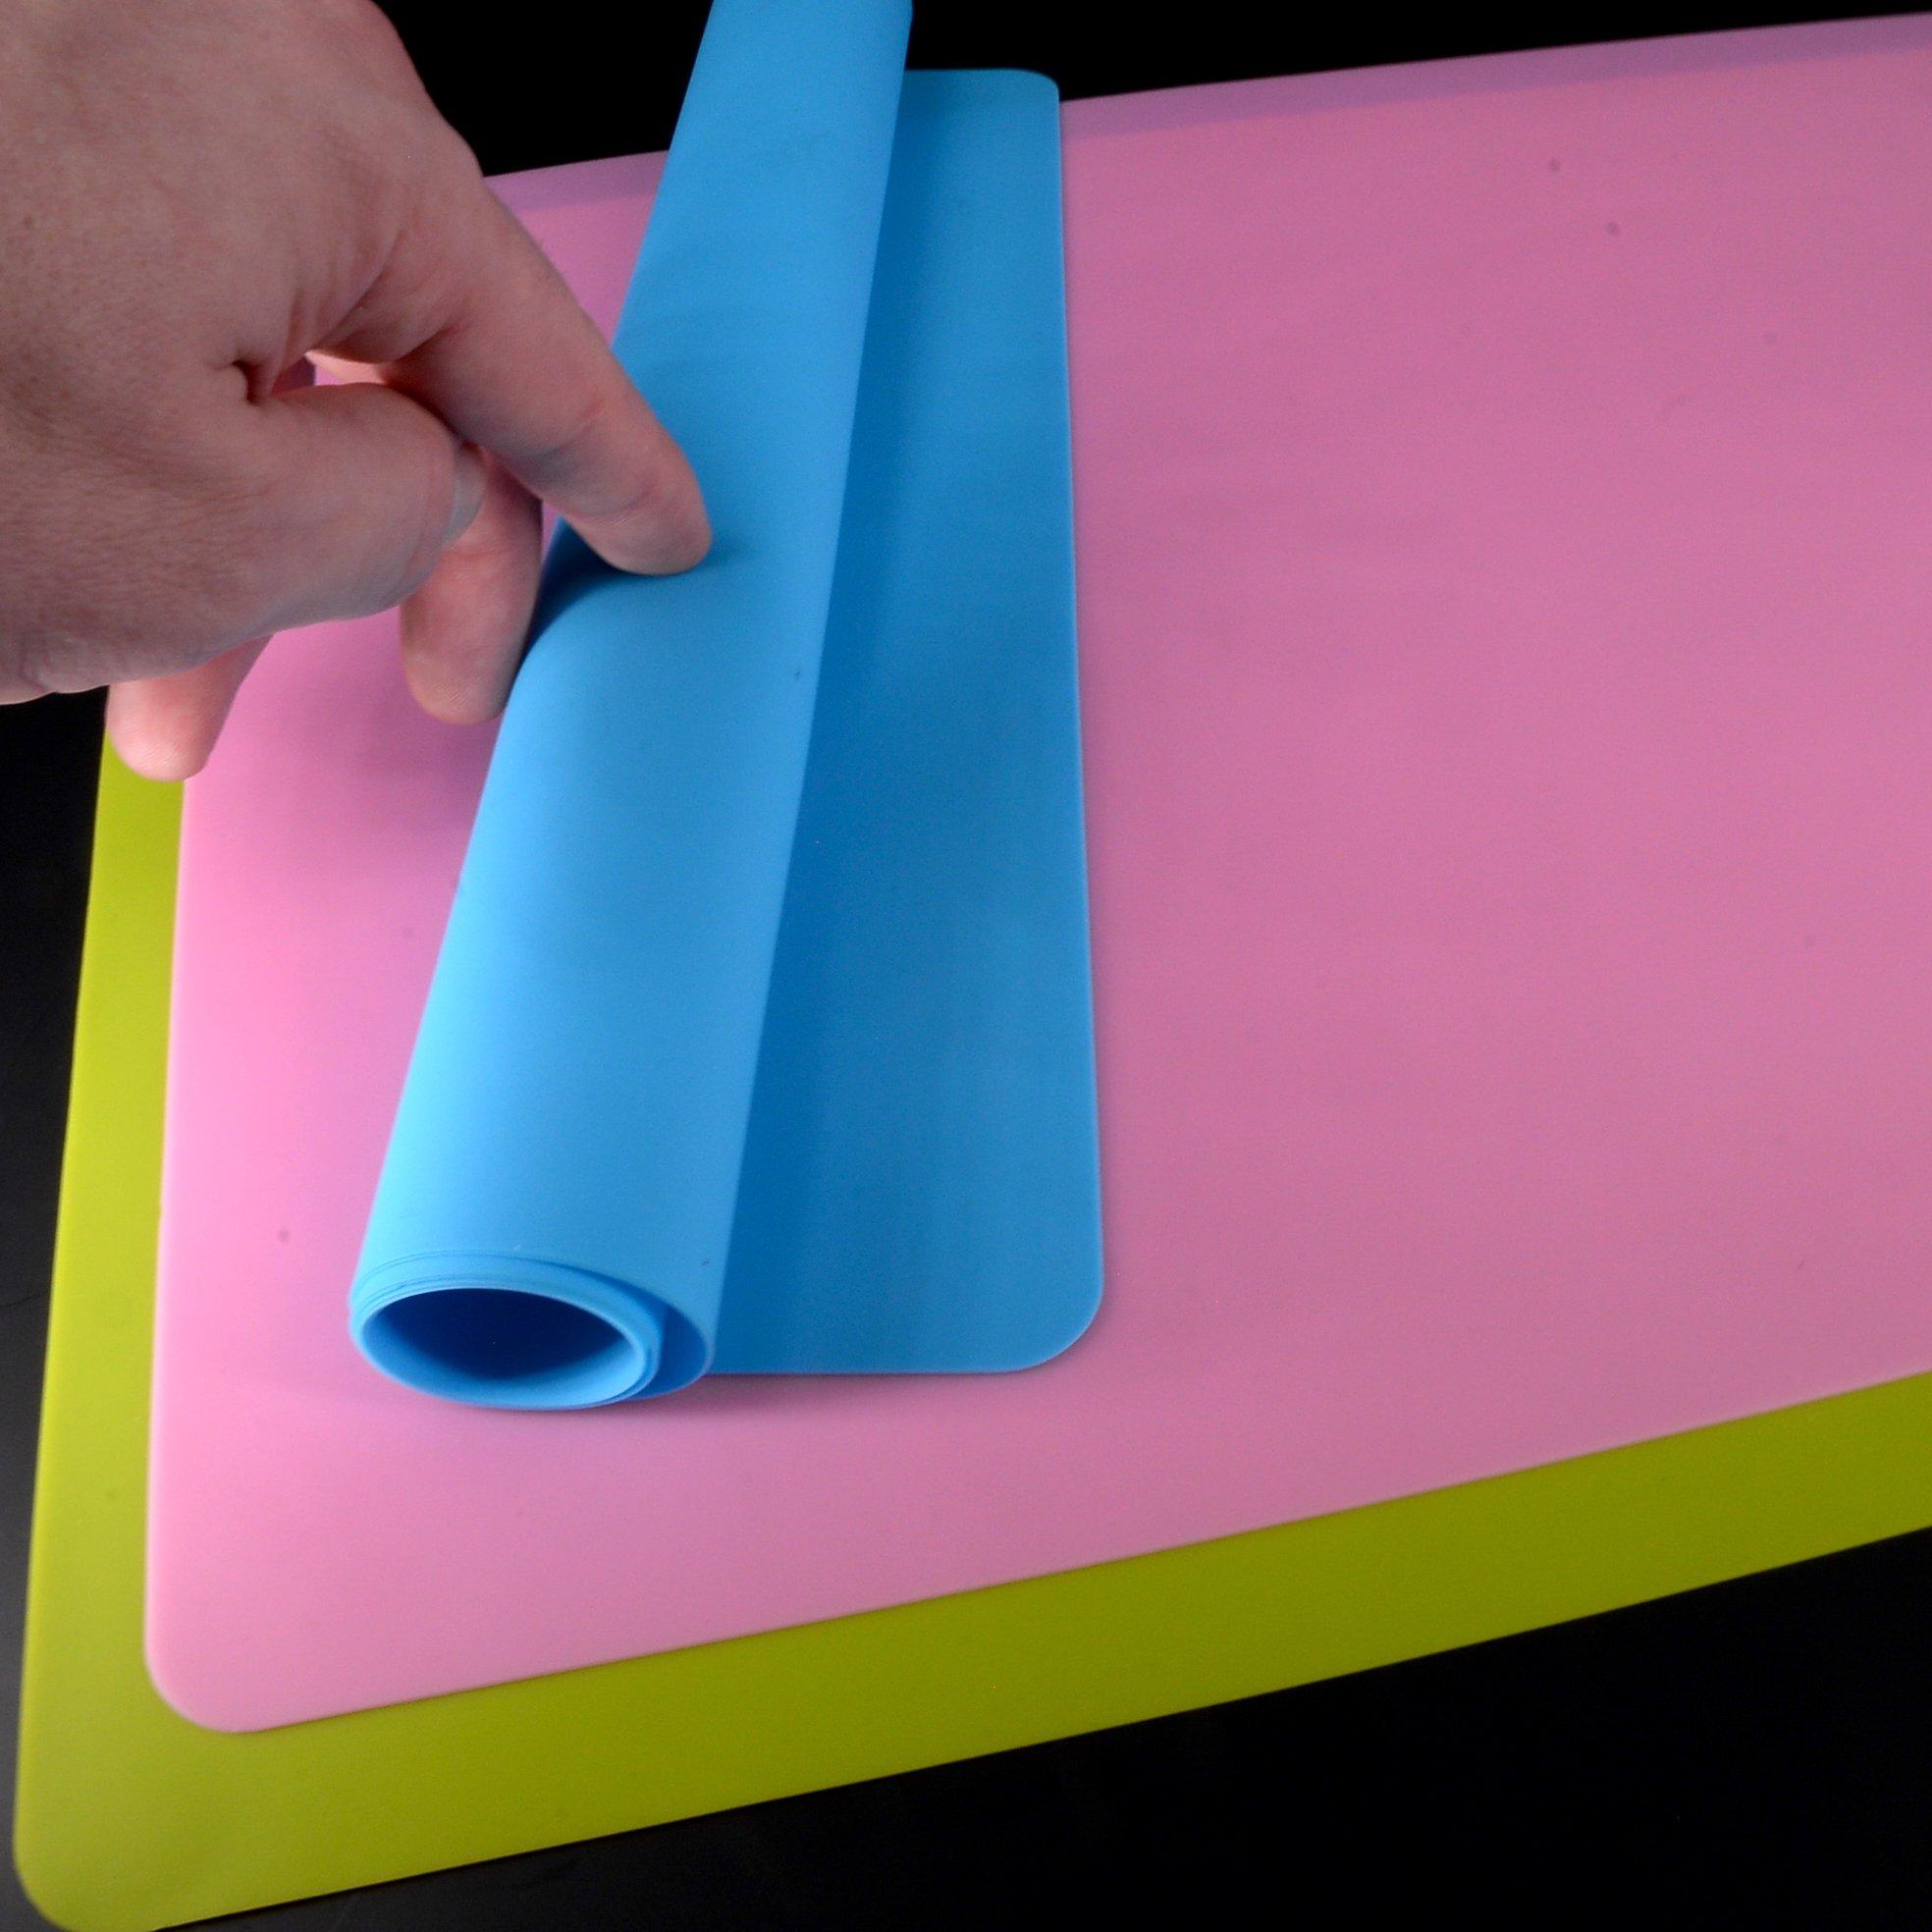 Placemat Set - Silicone Non Slip Food Placemats (40 x 30 CM) - Portable, Reusable Placemats by Yabber